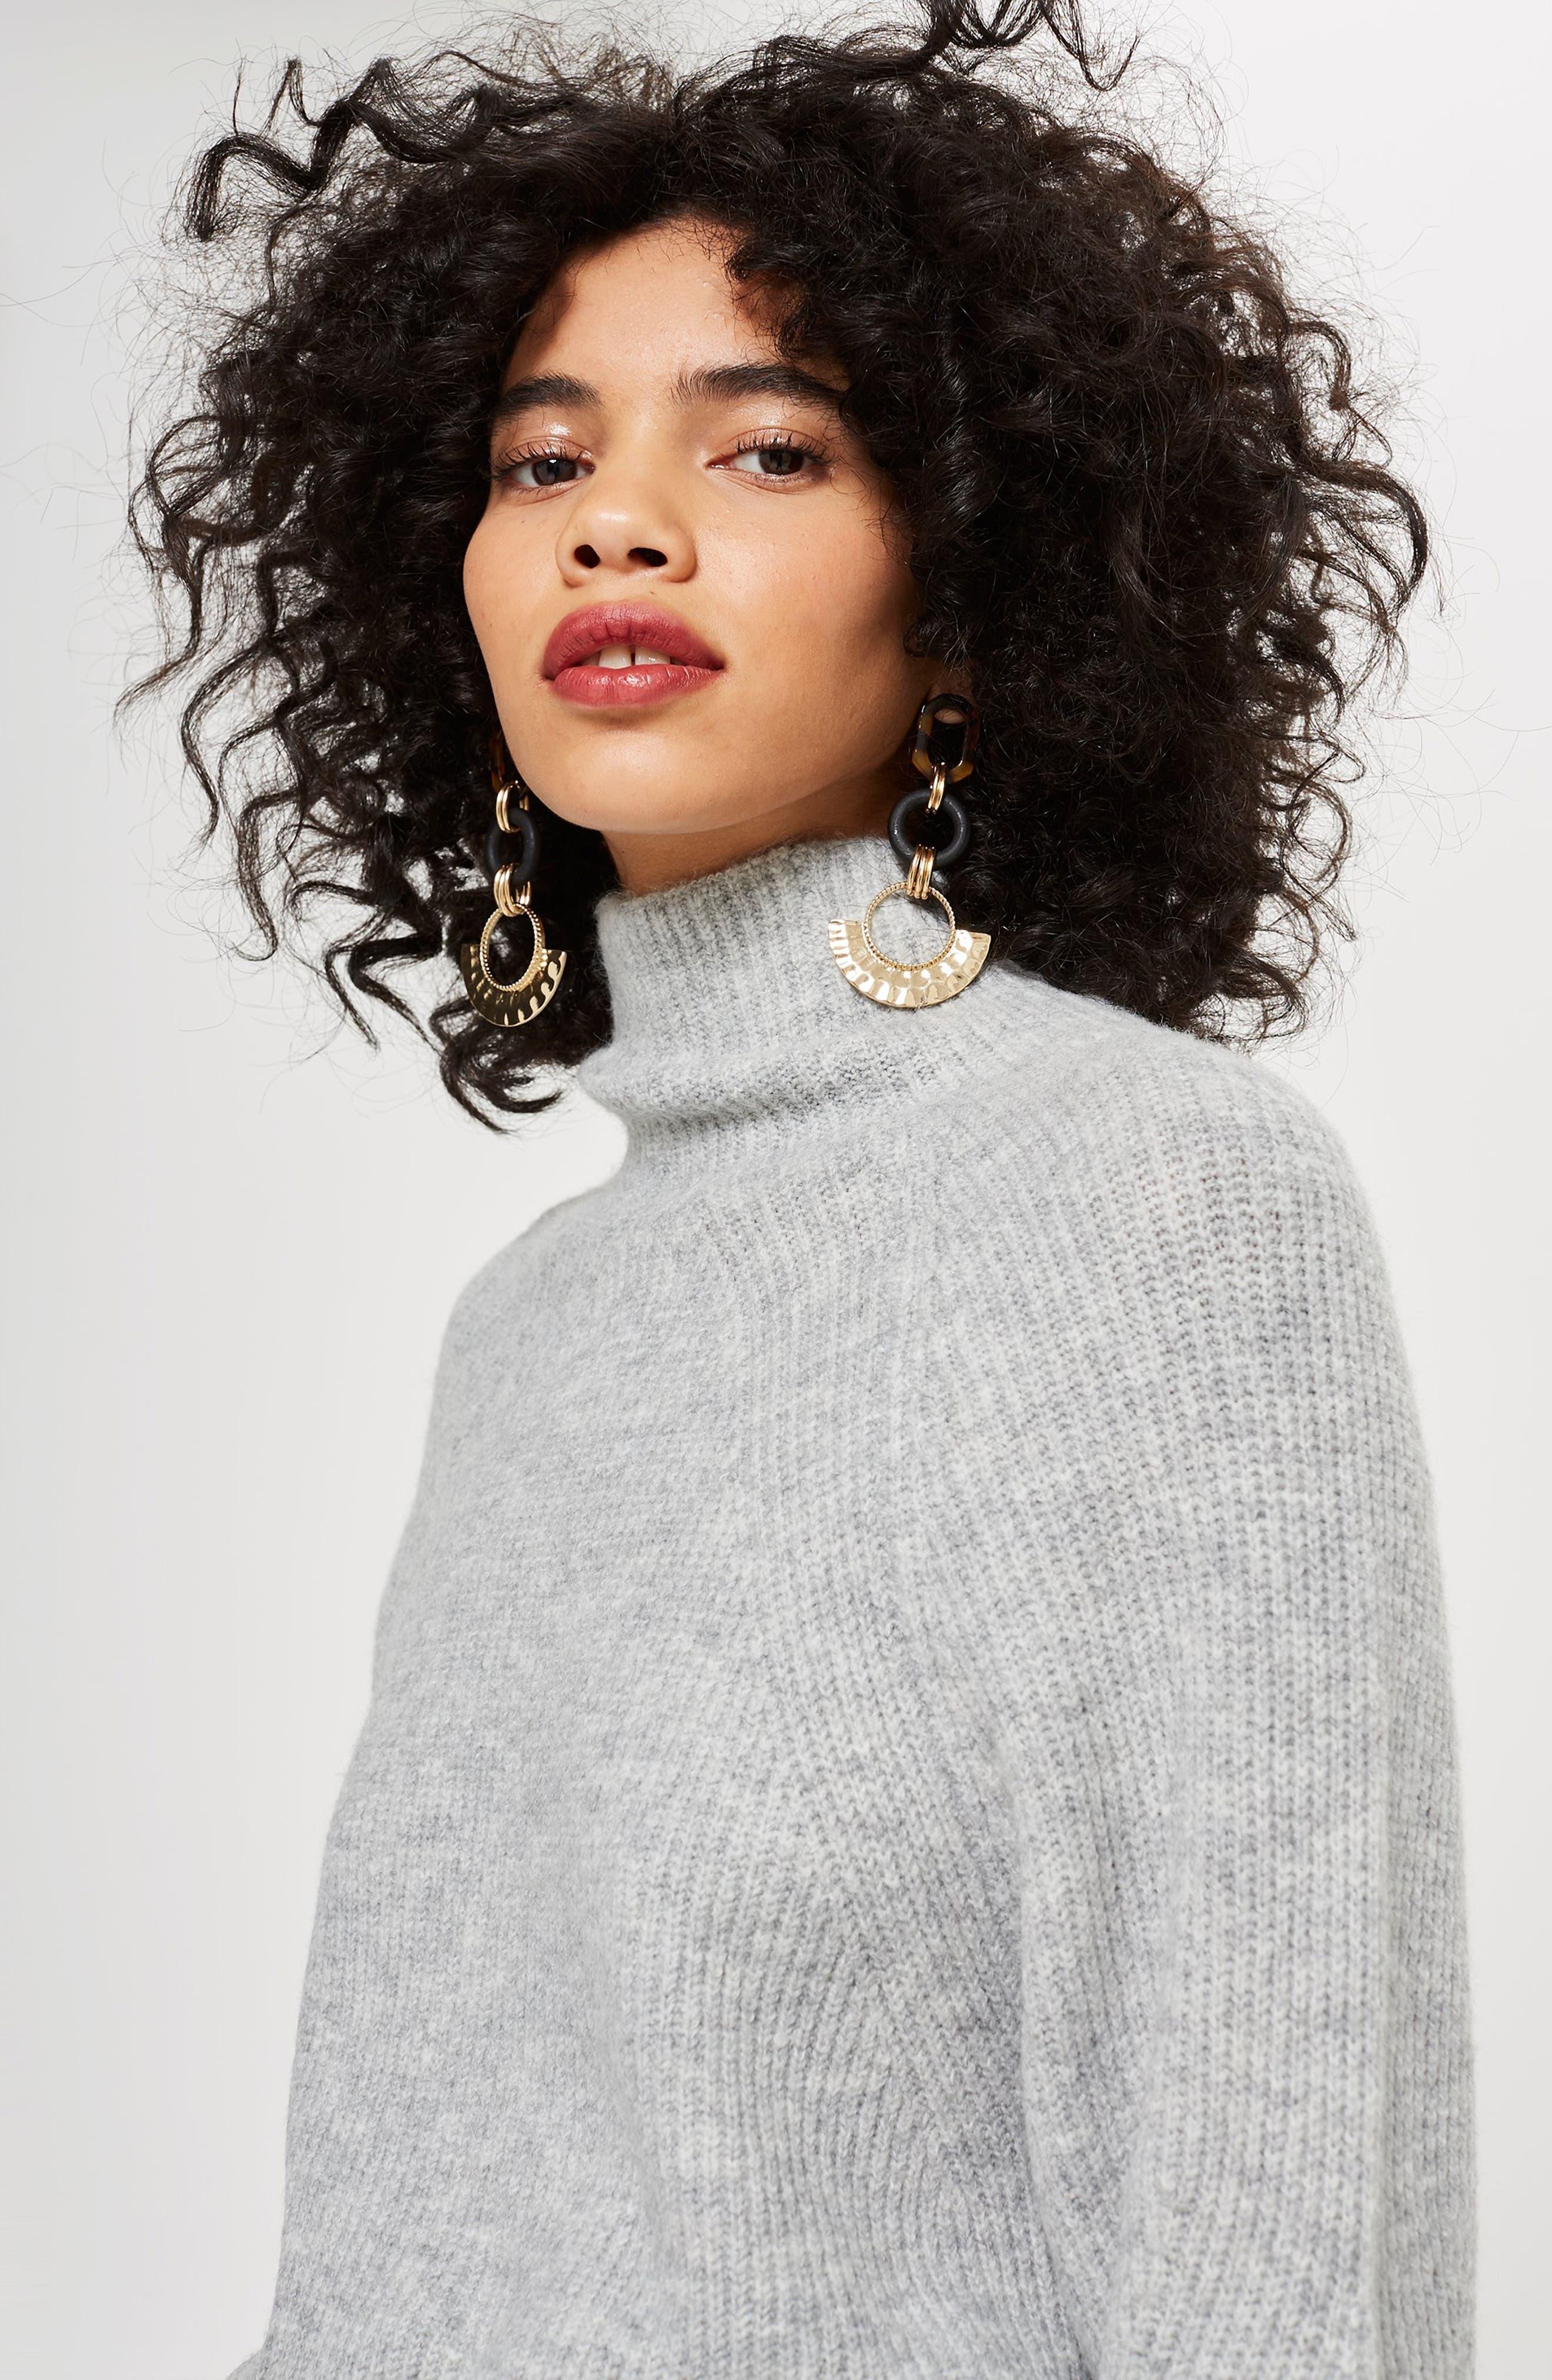 TOPSHOP, Raglan Turtleneck Neck Sweater, Alternate thumbnail 4, color, GREY MARL